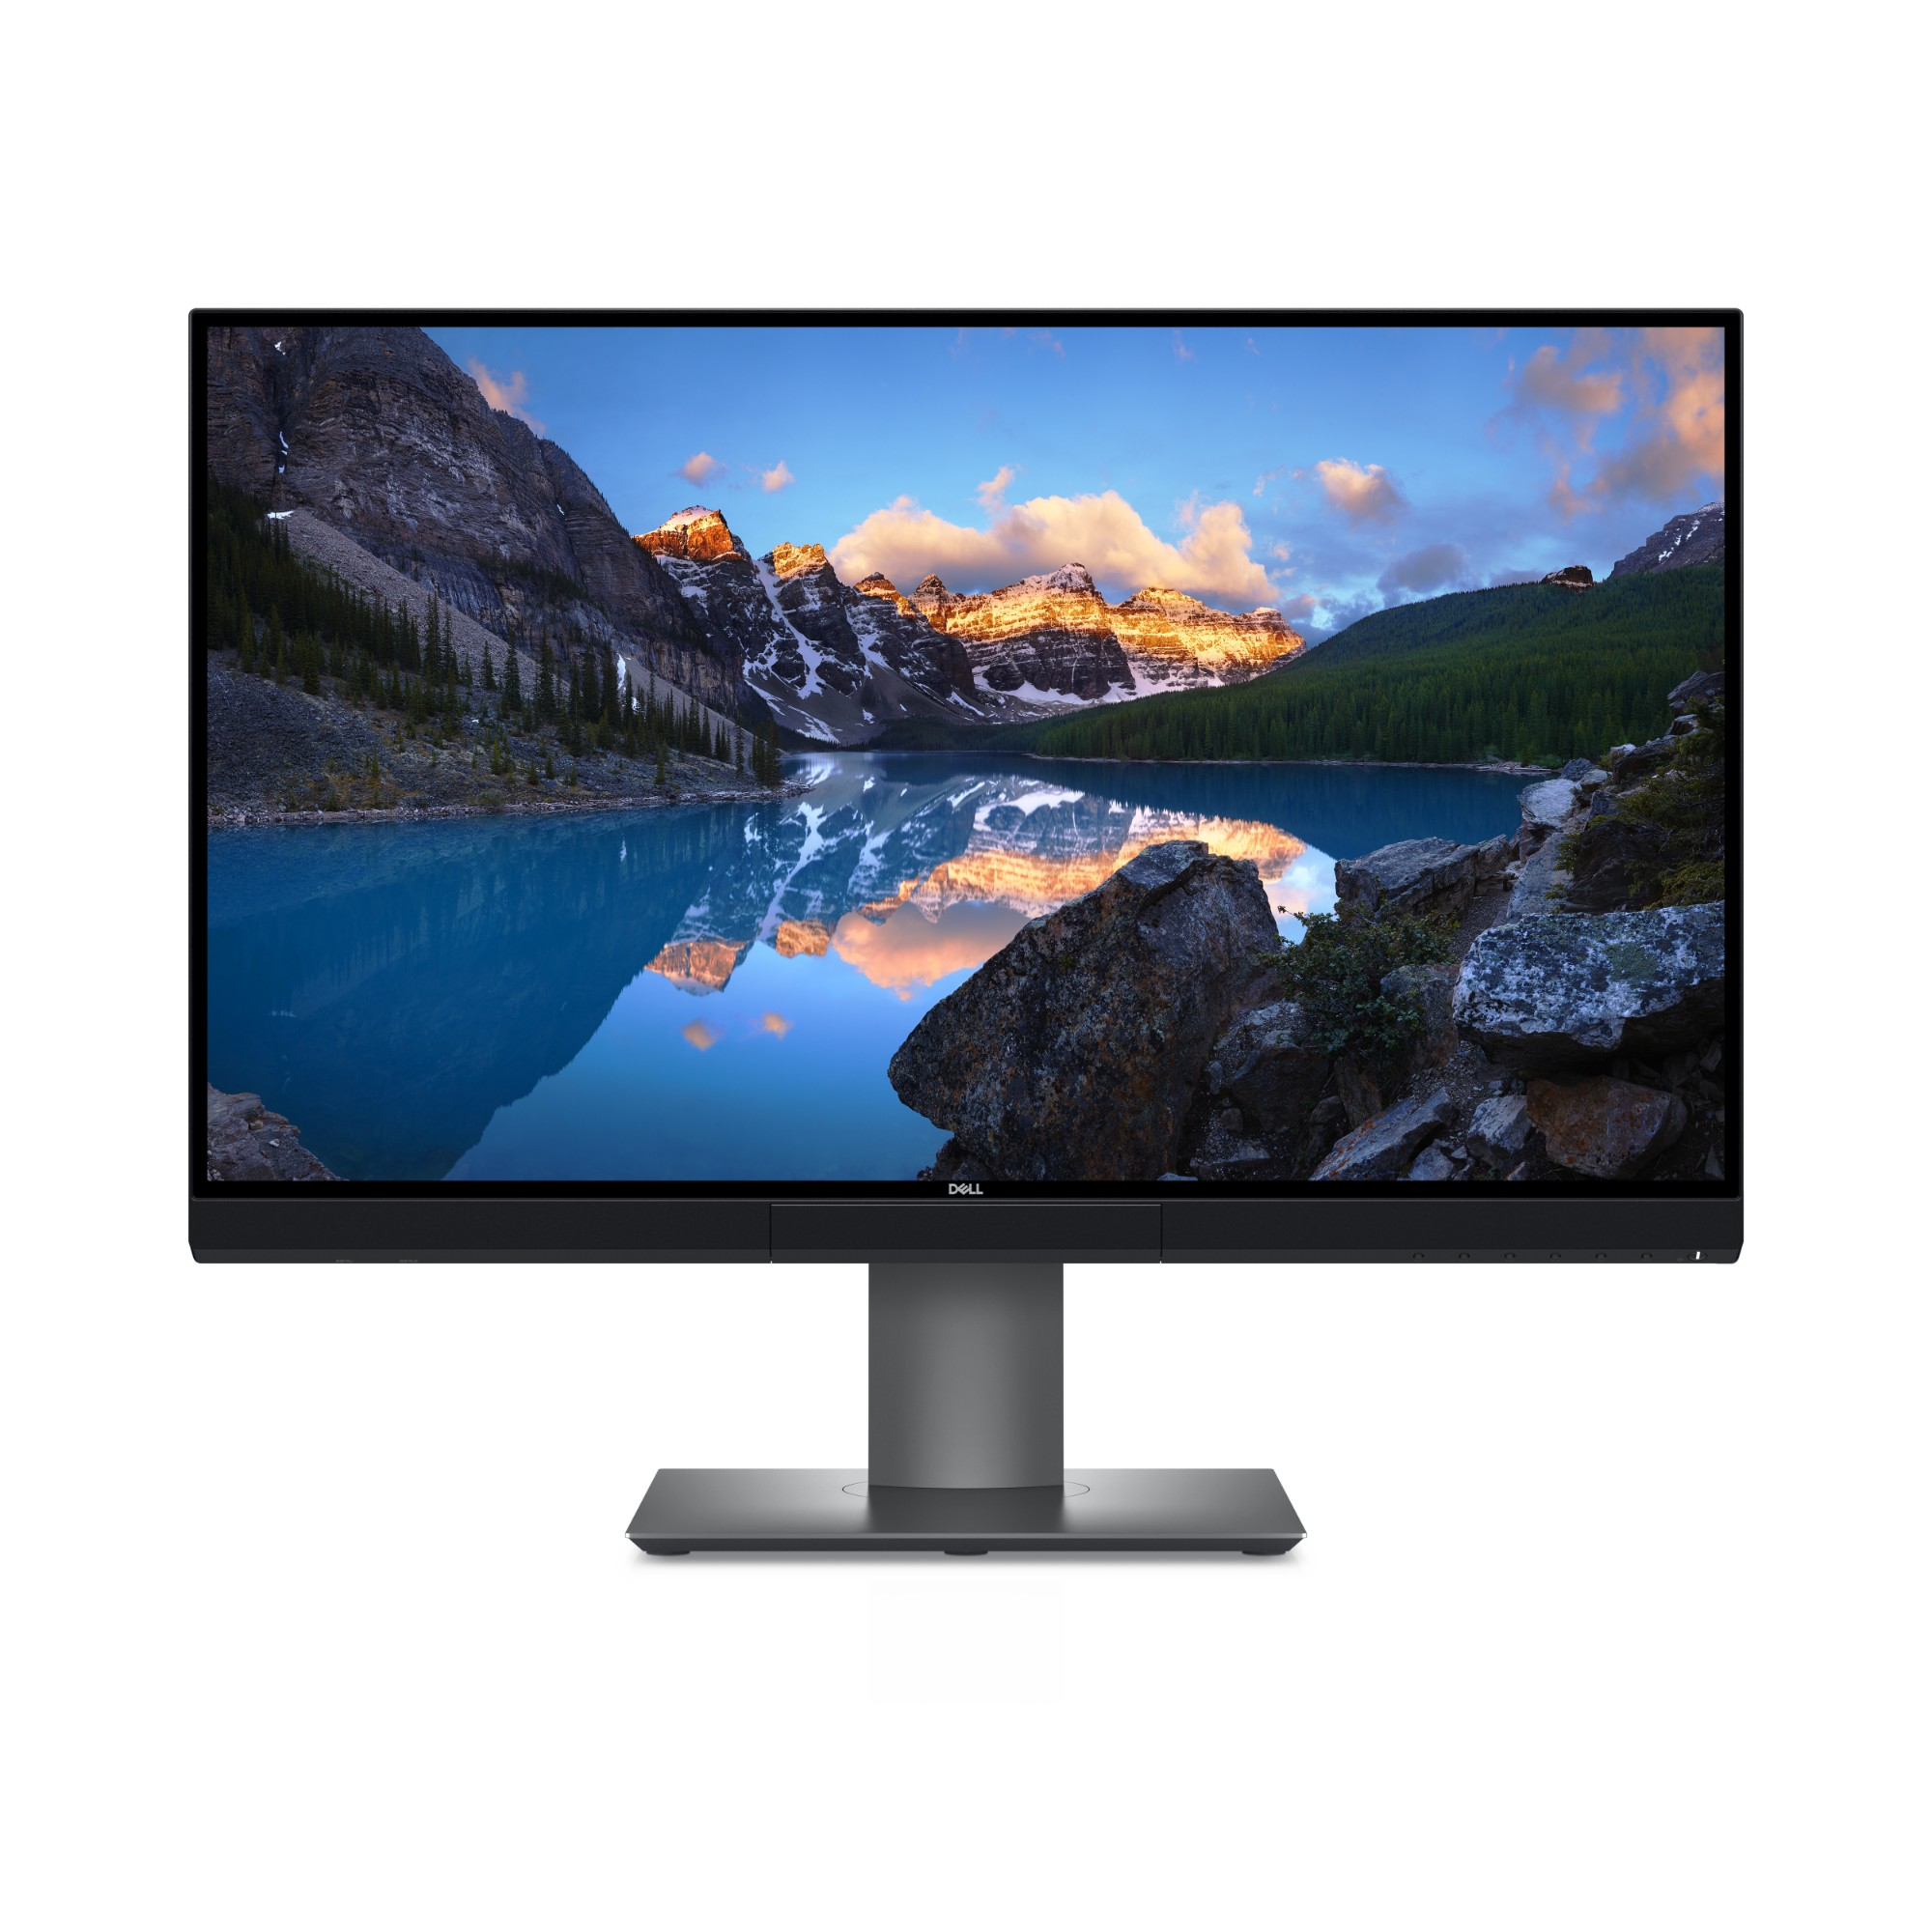 DELL UltraSharp 27 4K PremierColor Monitor: UP2720Q